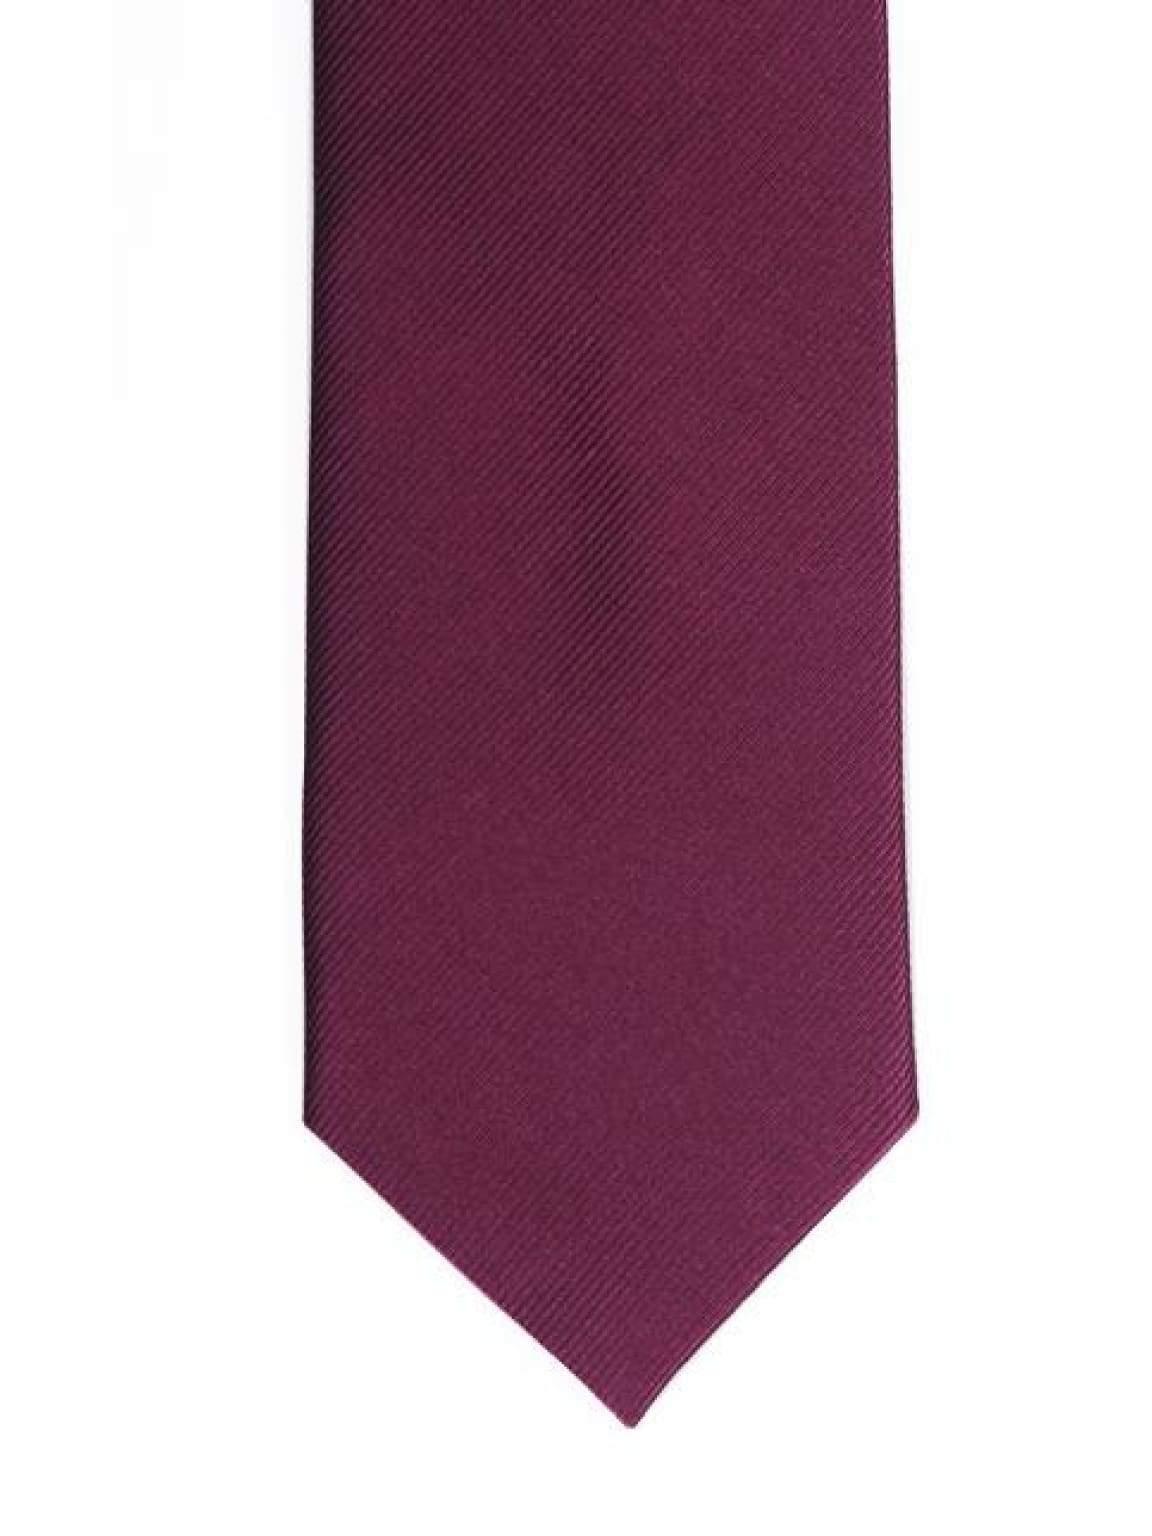 LA Smith Plain Plum Silk Tie - Accessories